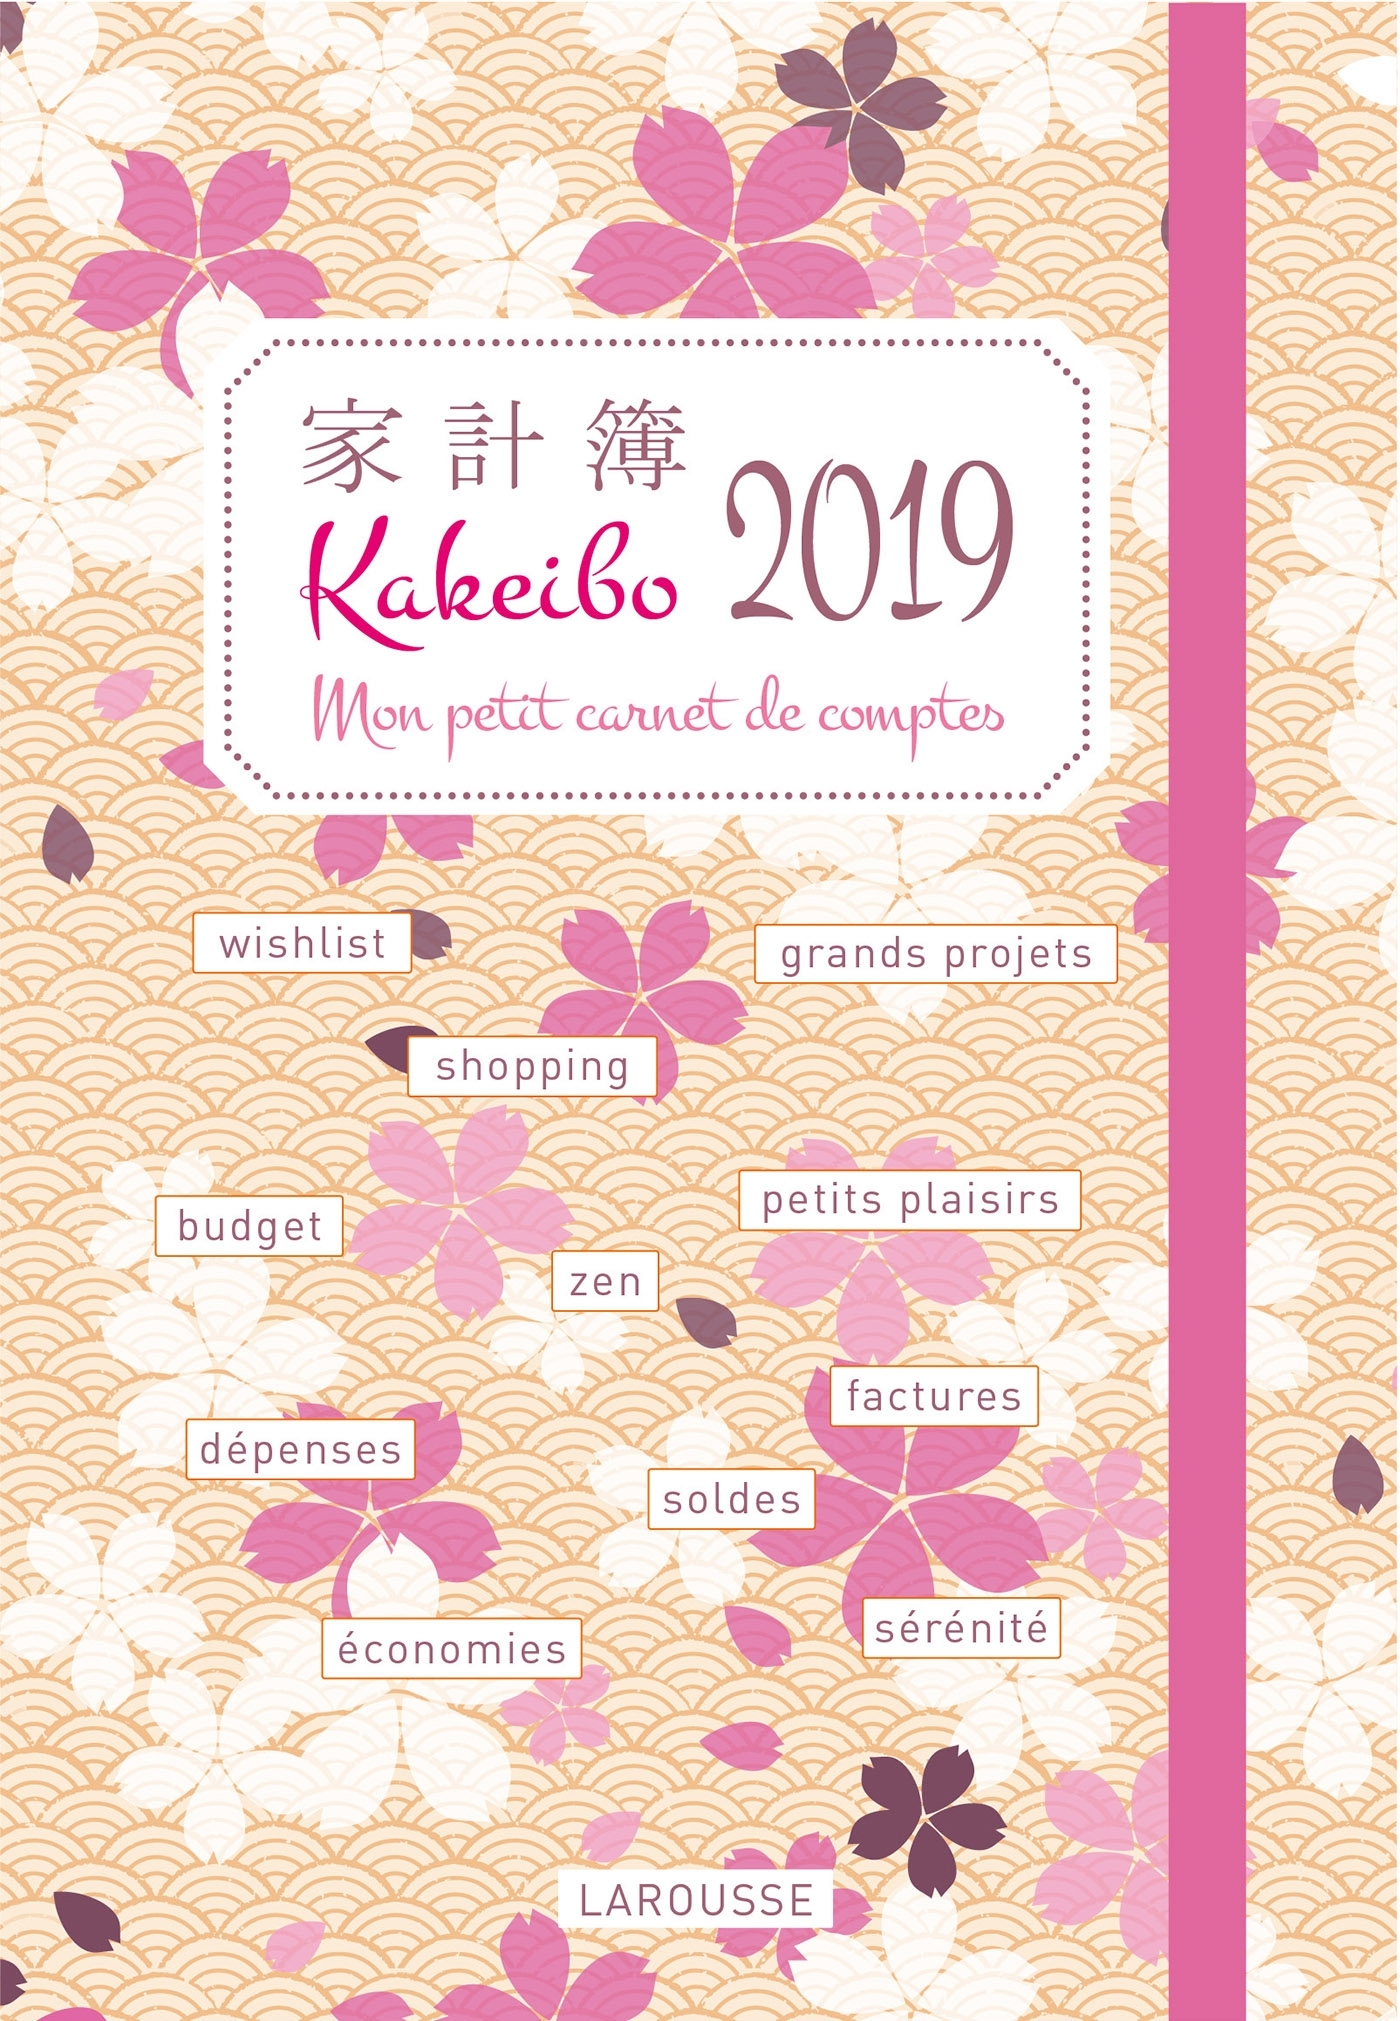 KAKEIBO 2019